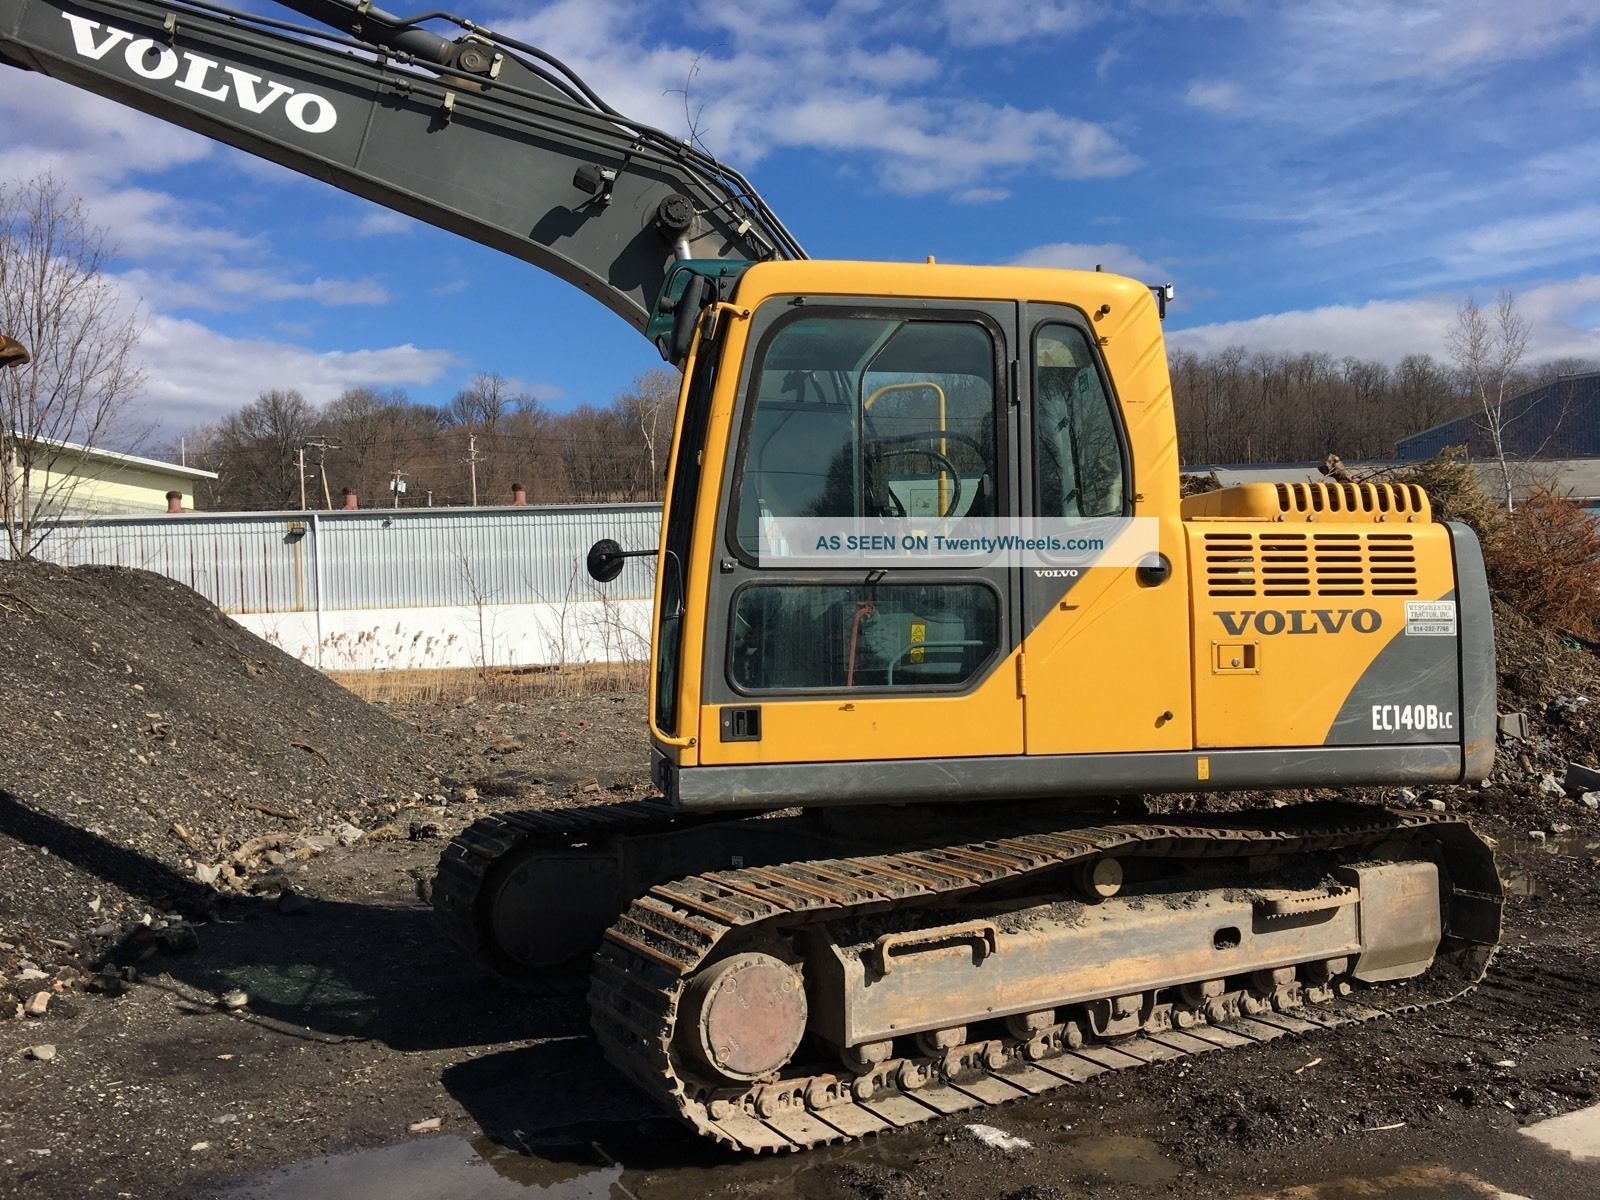 2006 Volvo Excavator Ec140